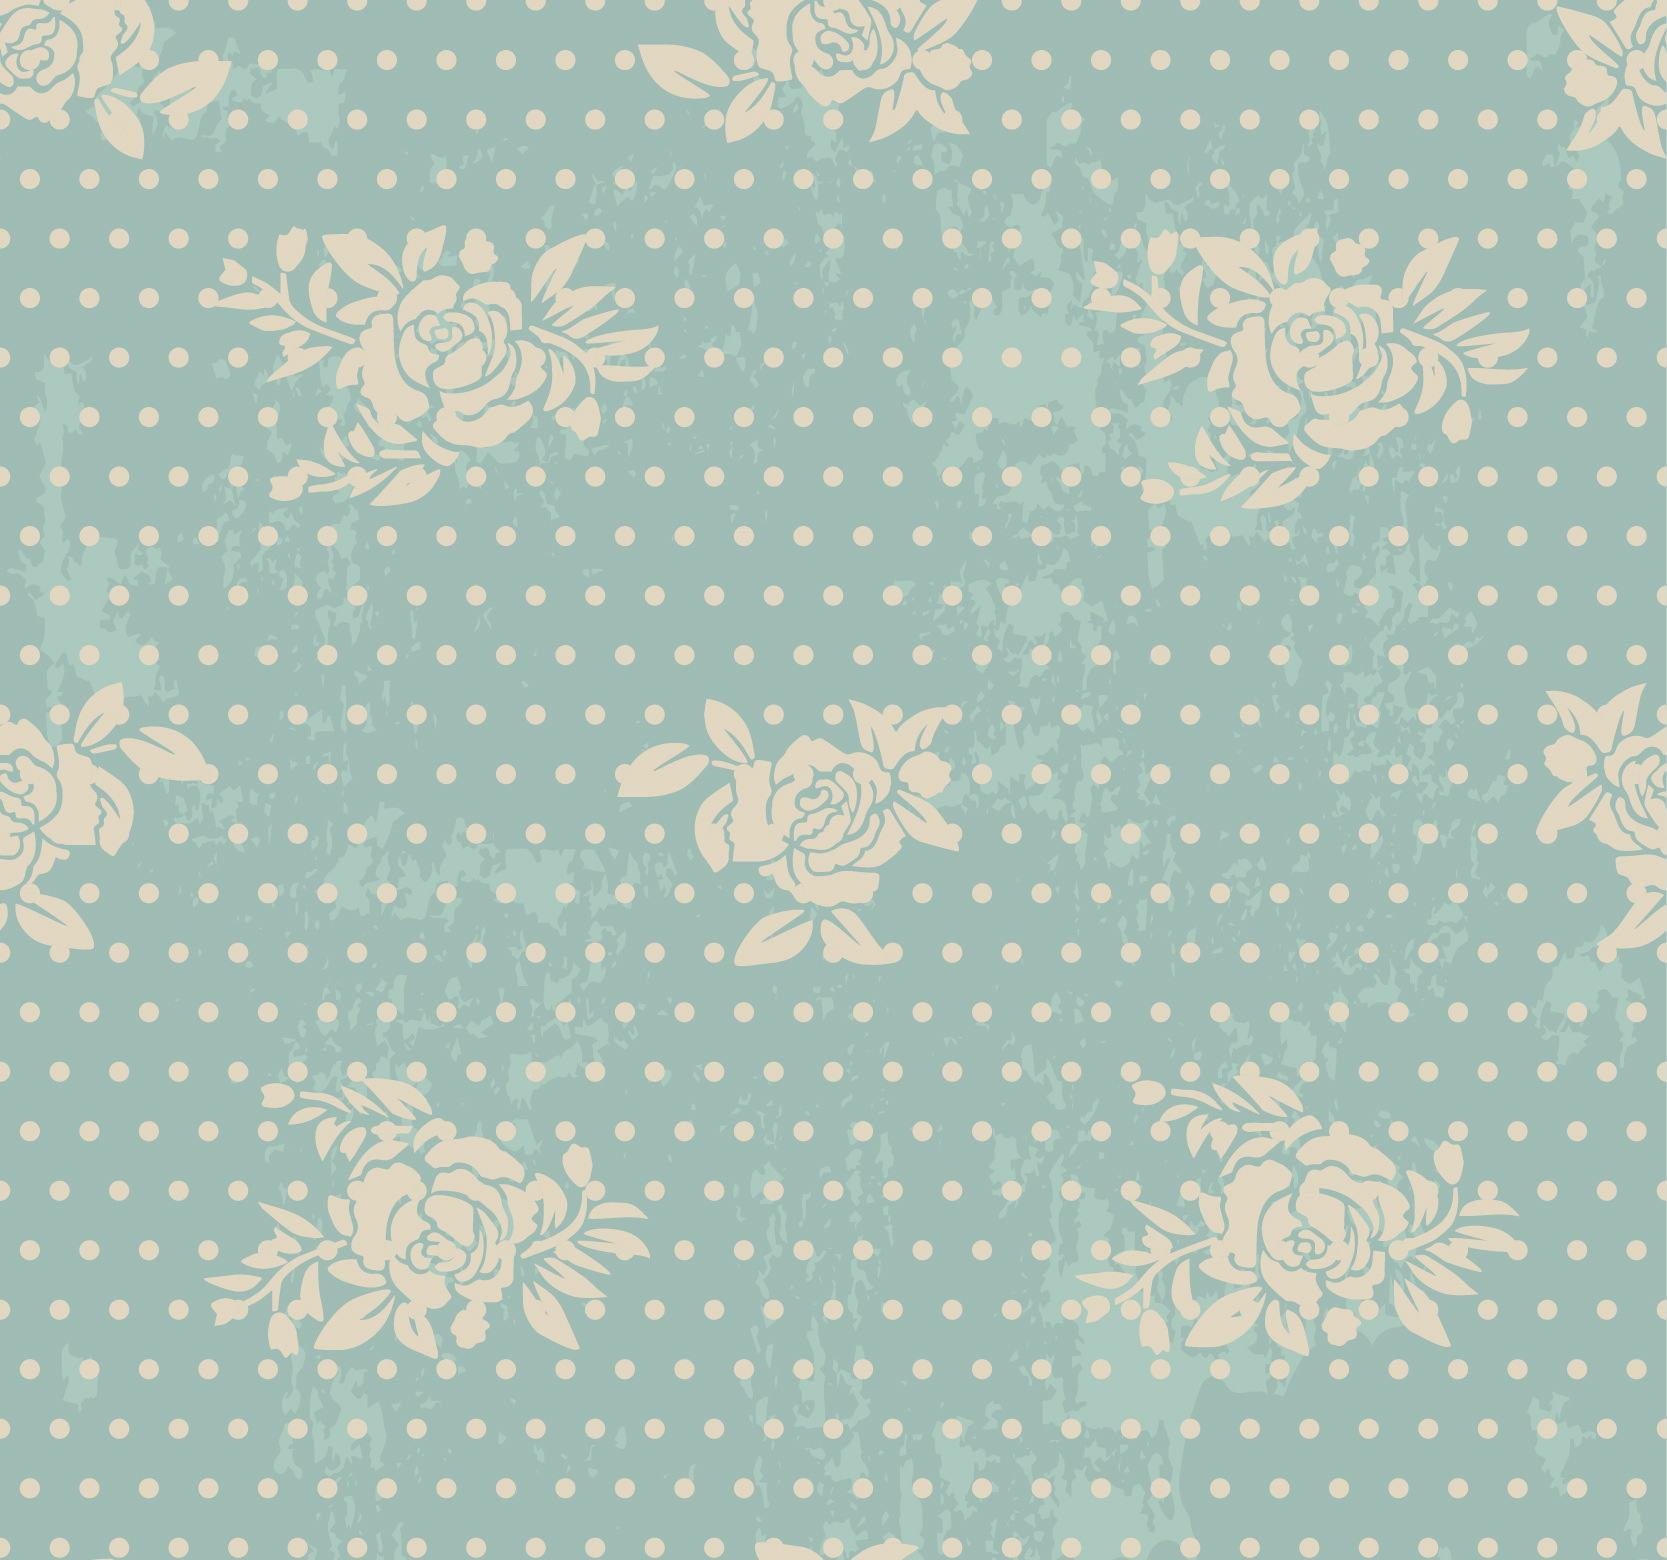 Retro Seamless Floral Patterns